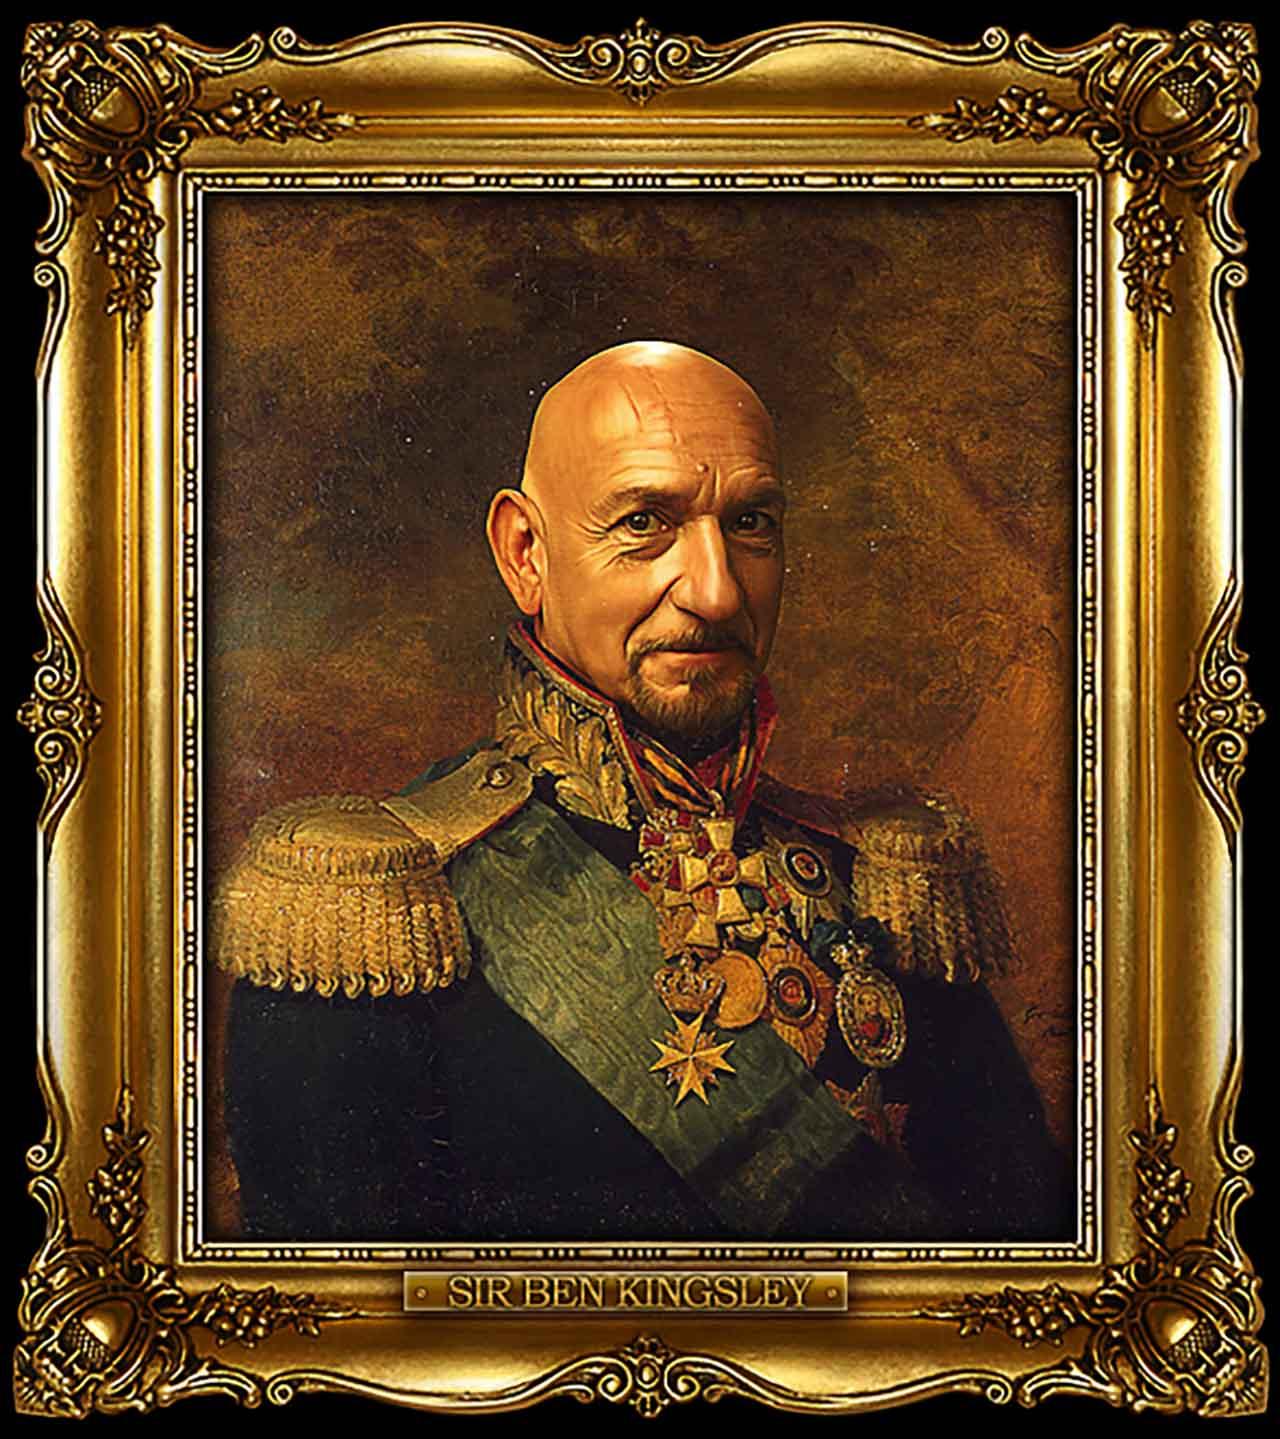 Artist Turns Famous Actors Into Russian Generals - Sir Ben Kingsley